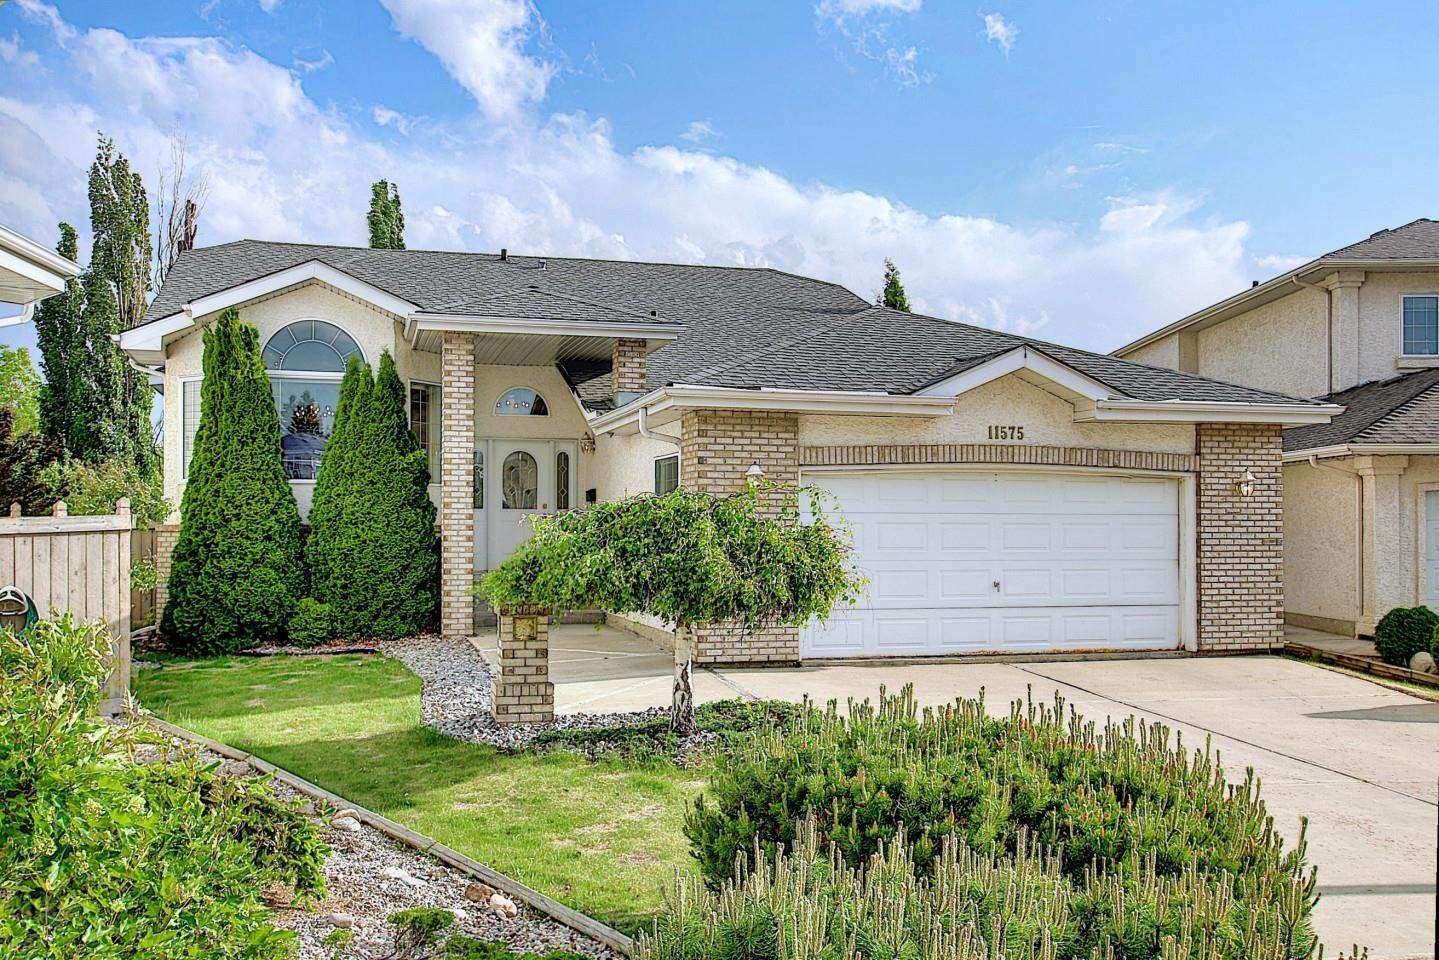 Main Photo: 11575 13 Avenue in Edmonton: Zone 16 House for sale : MLS®# E4257911